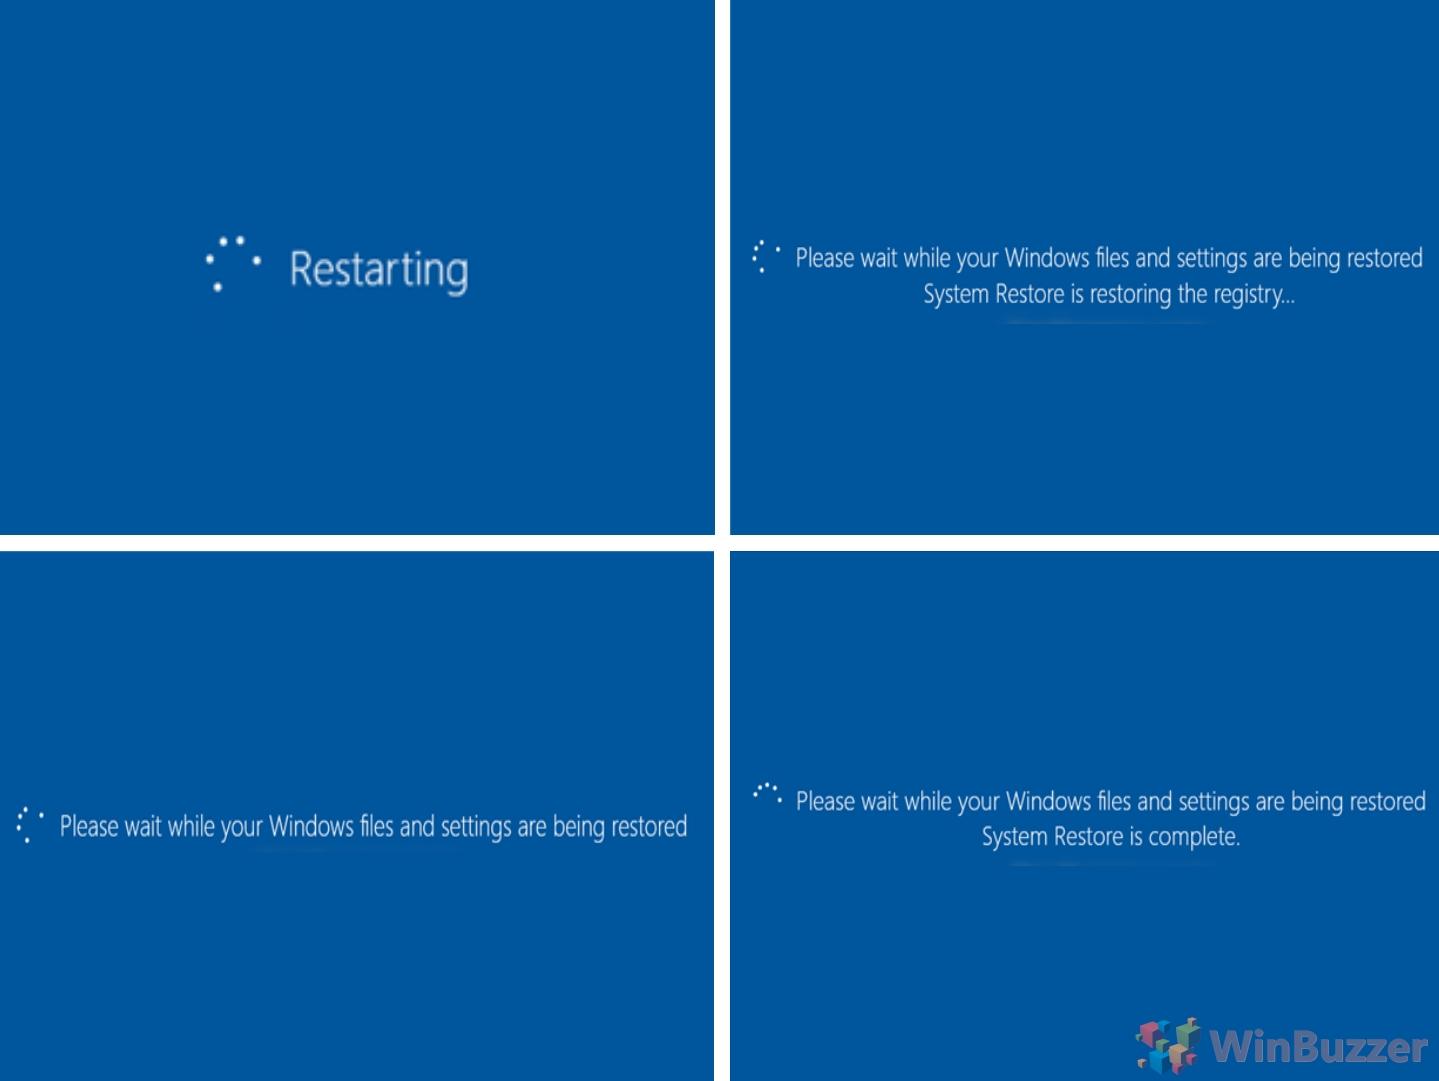 Windows 10 - Advanced Startup - System restore - System Restore process (1)